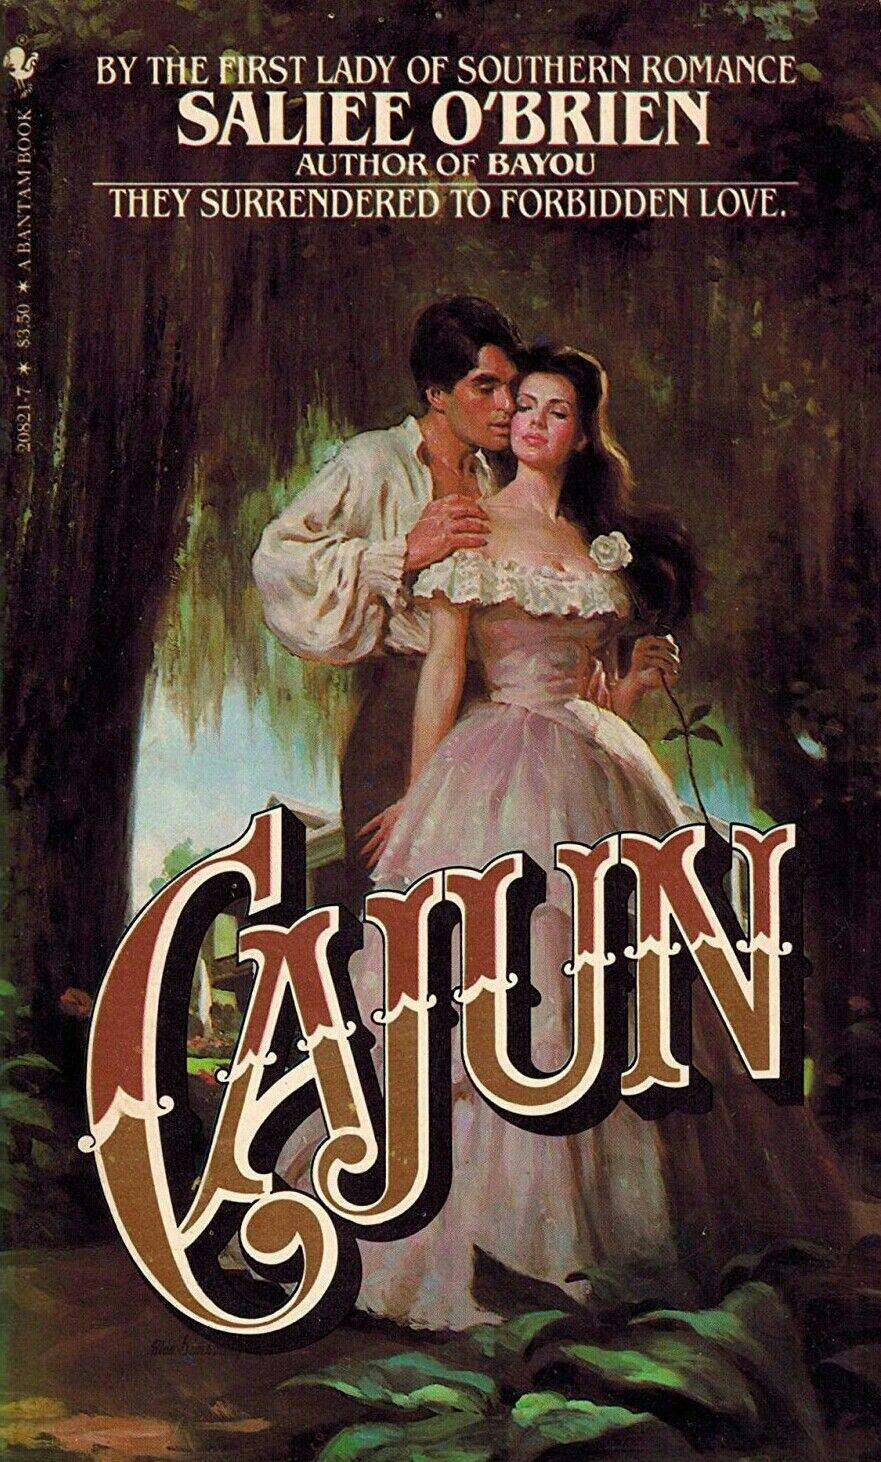 Pin By Iolanda Sousa On Romance Book Covers Romance Covers Art Romance Novel Covers Romantic Books